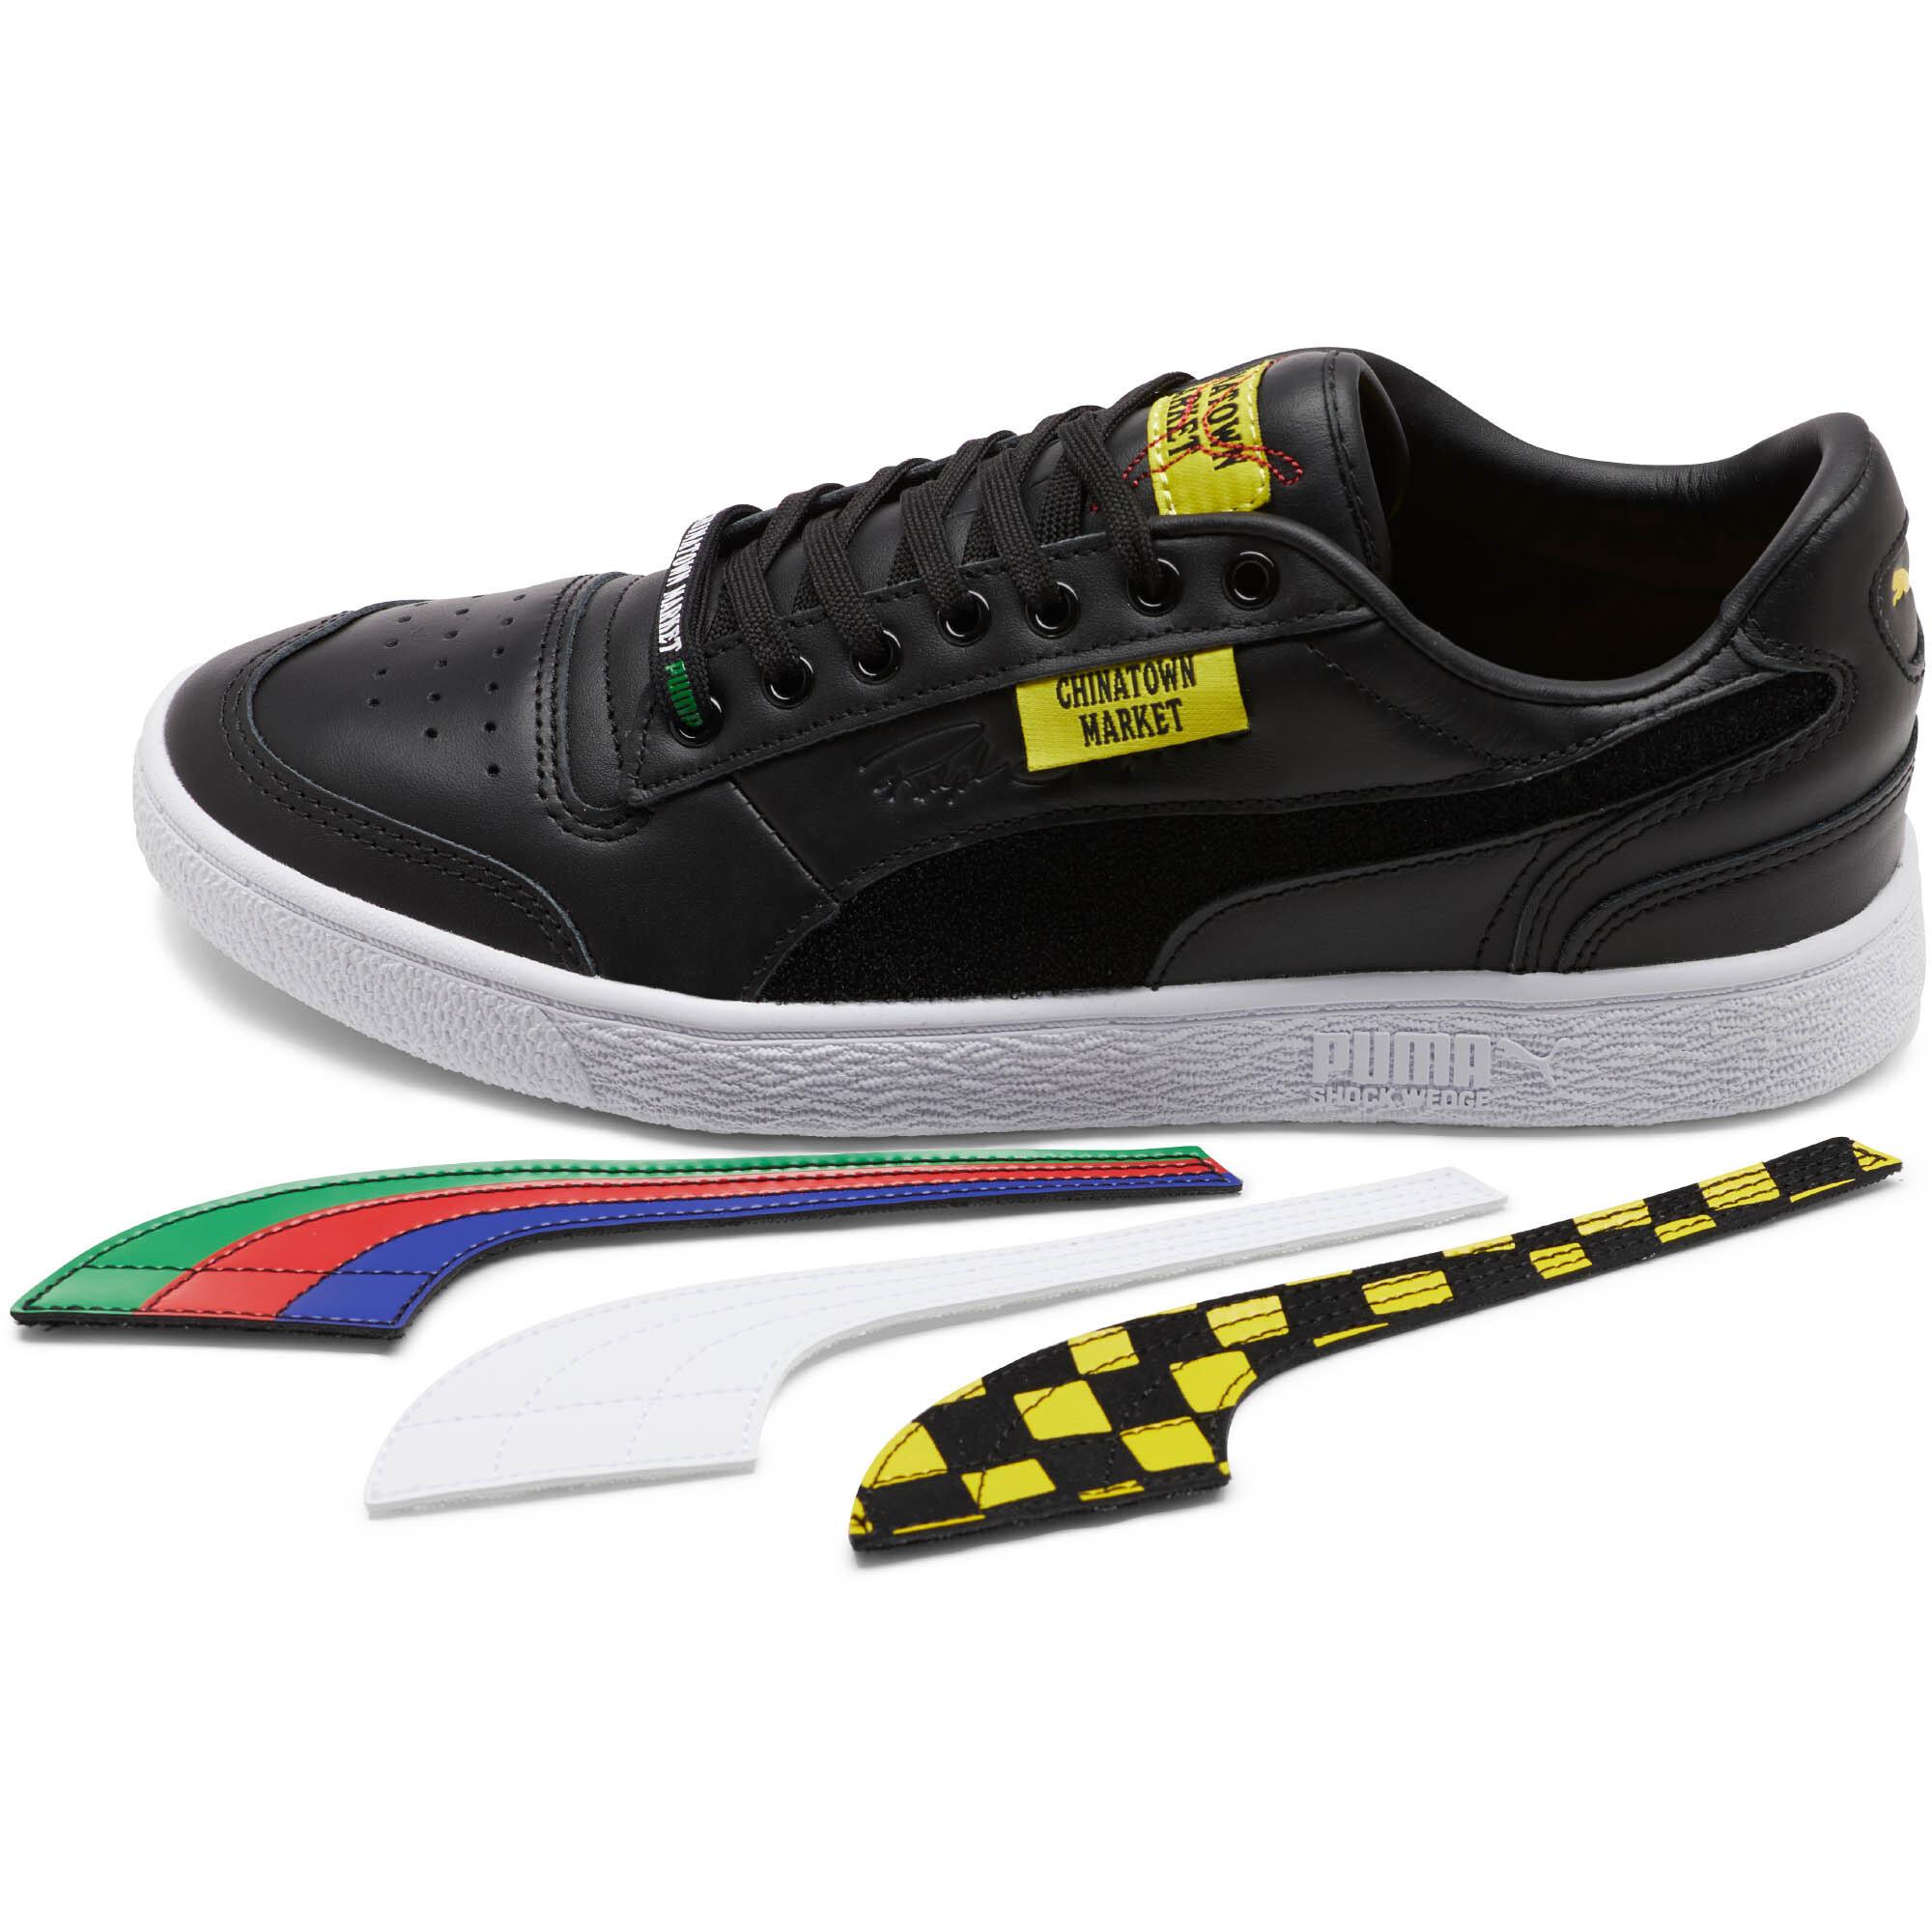 PUMA x RALPH SAMPSON Chinatown Market Sneakers